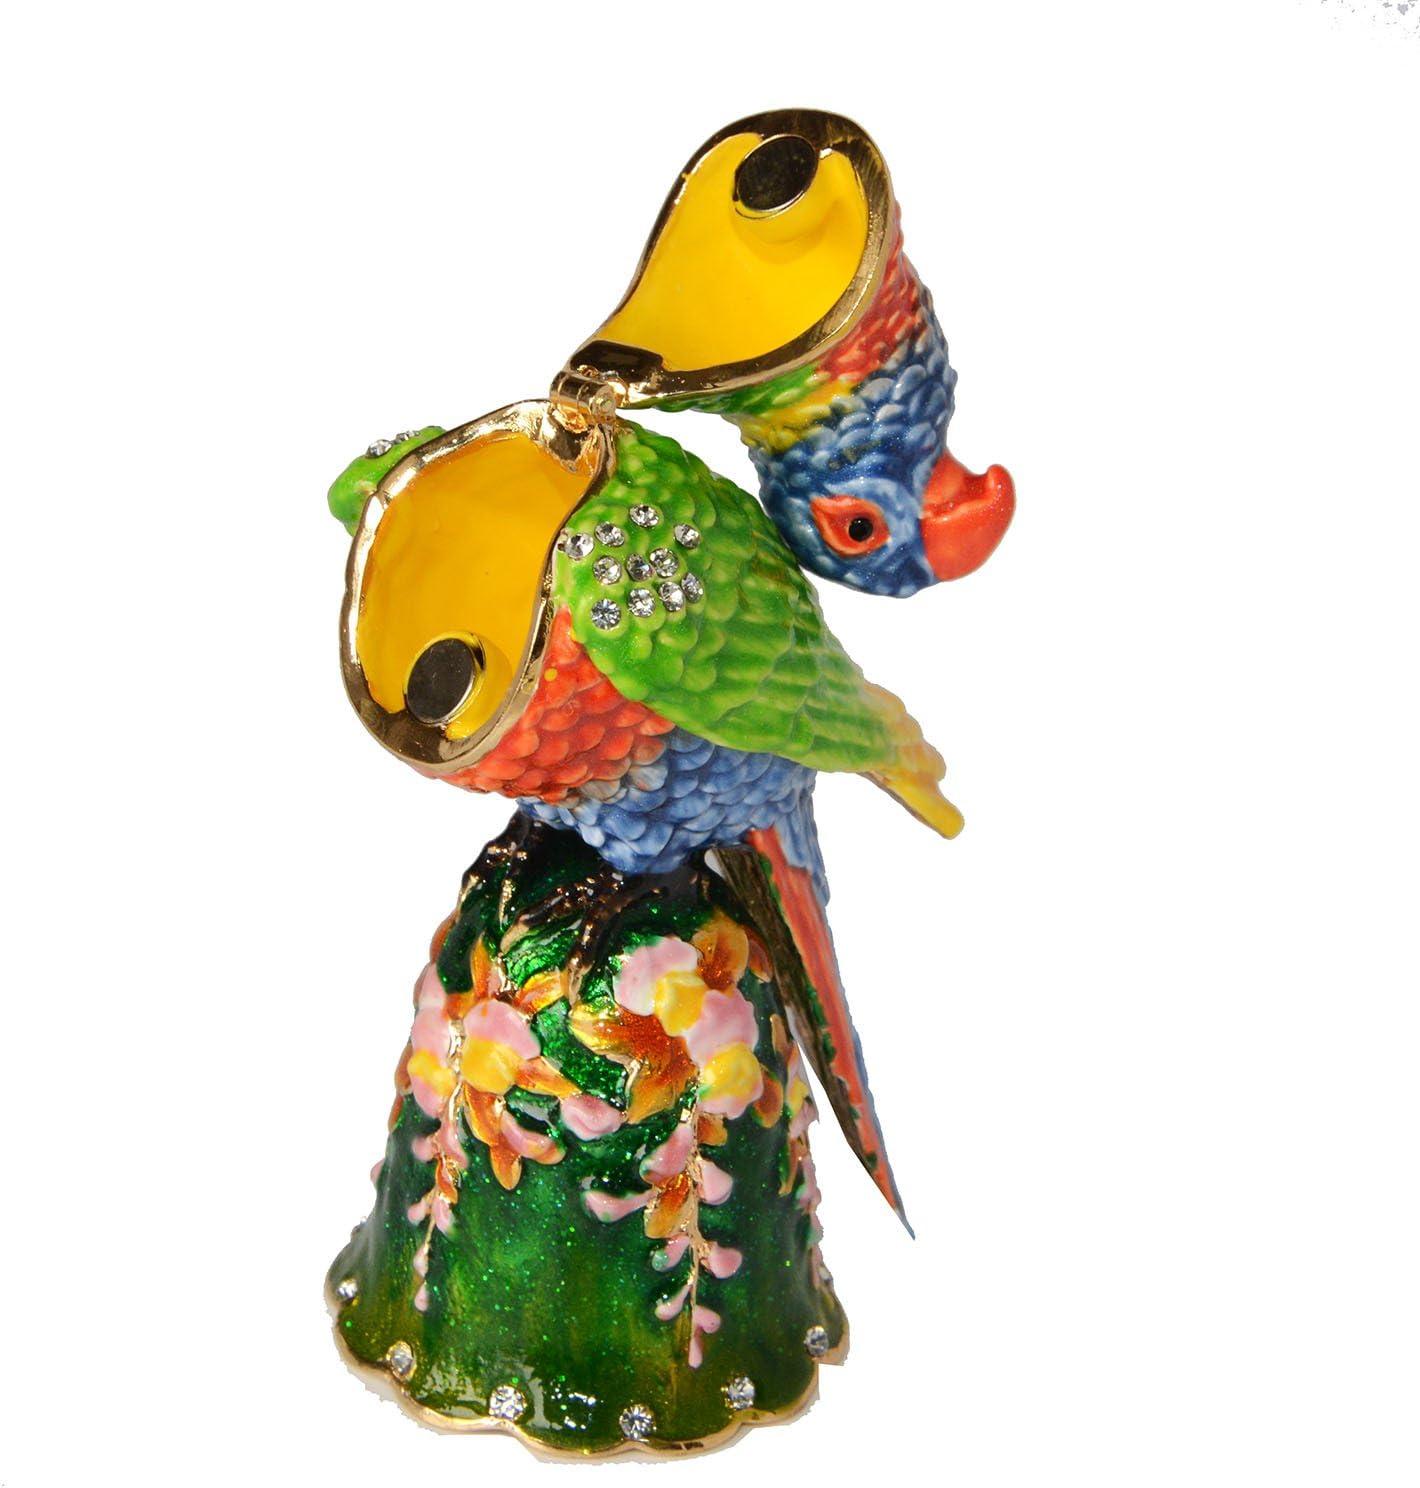 Jiaheyou Macaw Parrot Trinket Box Enameled Hinged Jewelry Box Metal Ornament Gifts Bird Figurine Tabletop